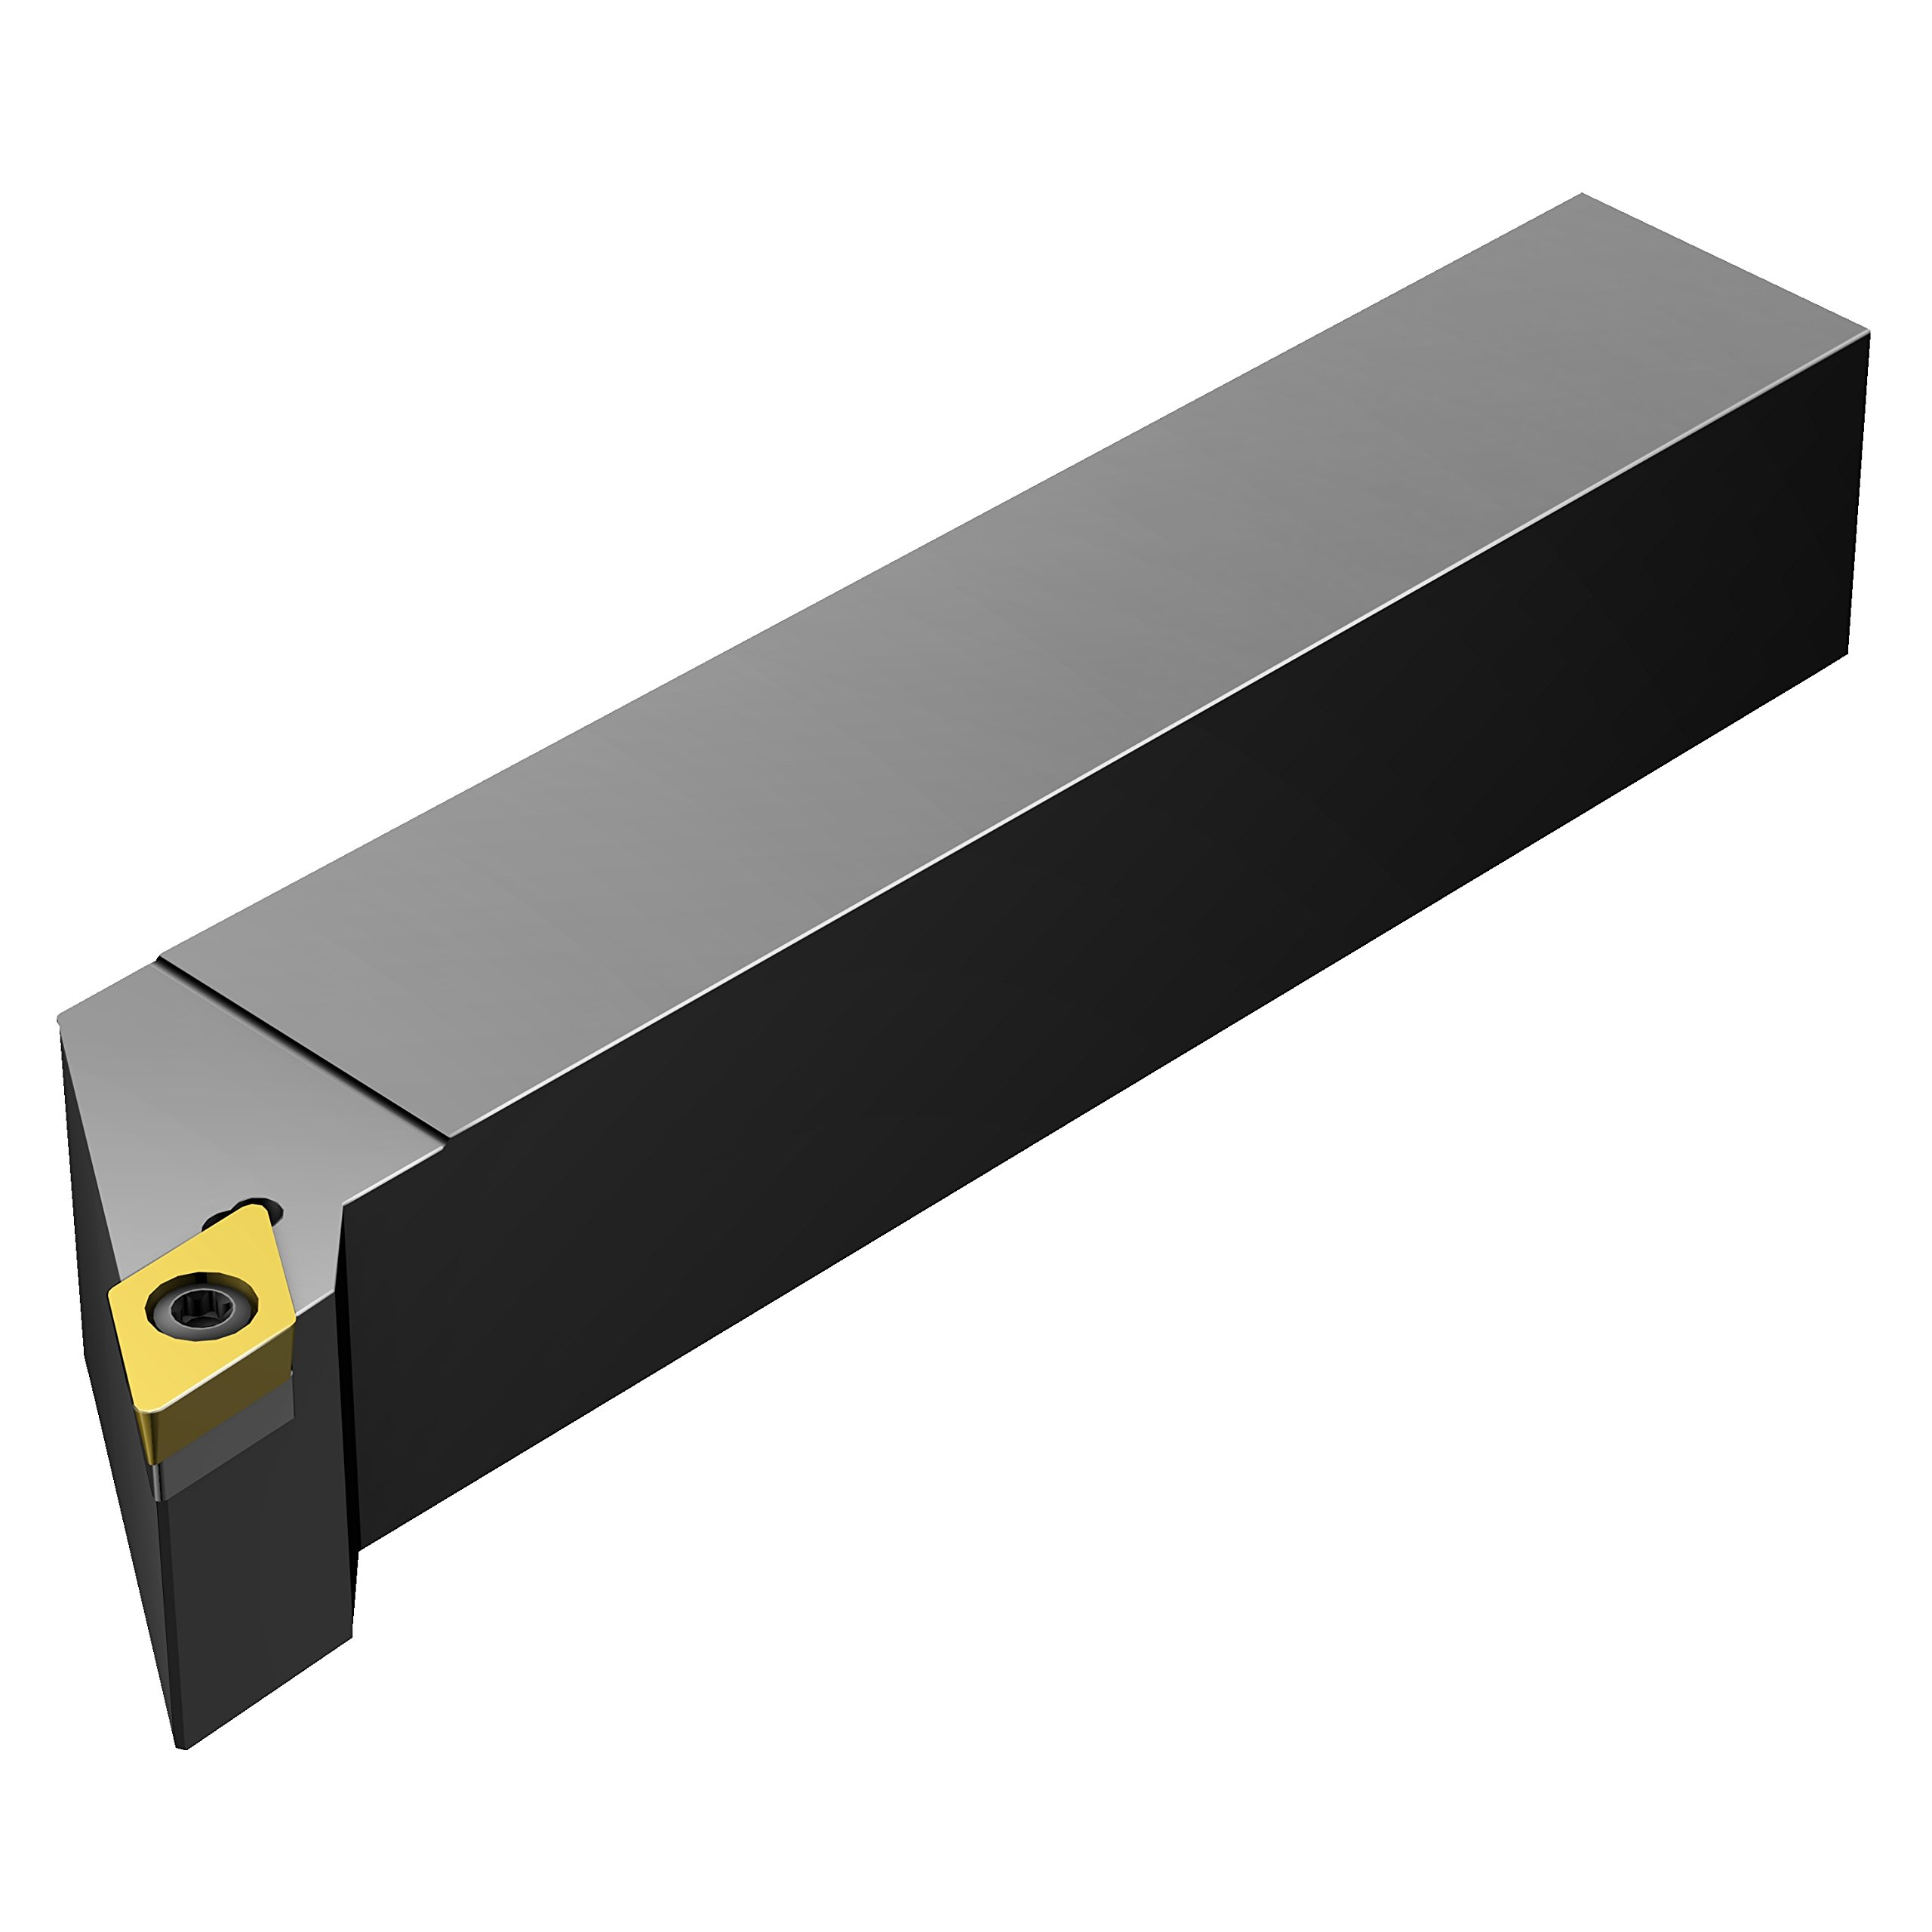 Sandvik Coromant SDJCL 16 3C Turning Insert Holder, Square Shank, Steel, External, Screw Clamp, Left Hand, 1'' Width x 1'' Height Shank, 5'' Length x 1.25'' Width, DCMT 3(2.5)2 Insert Size